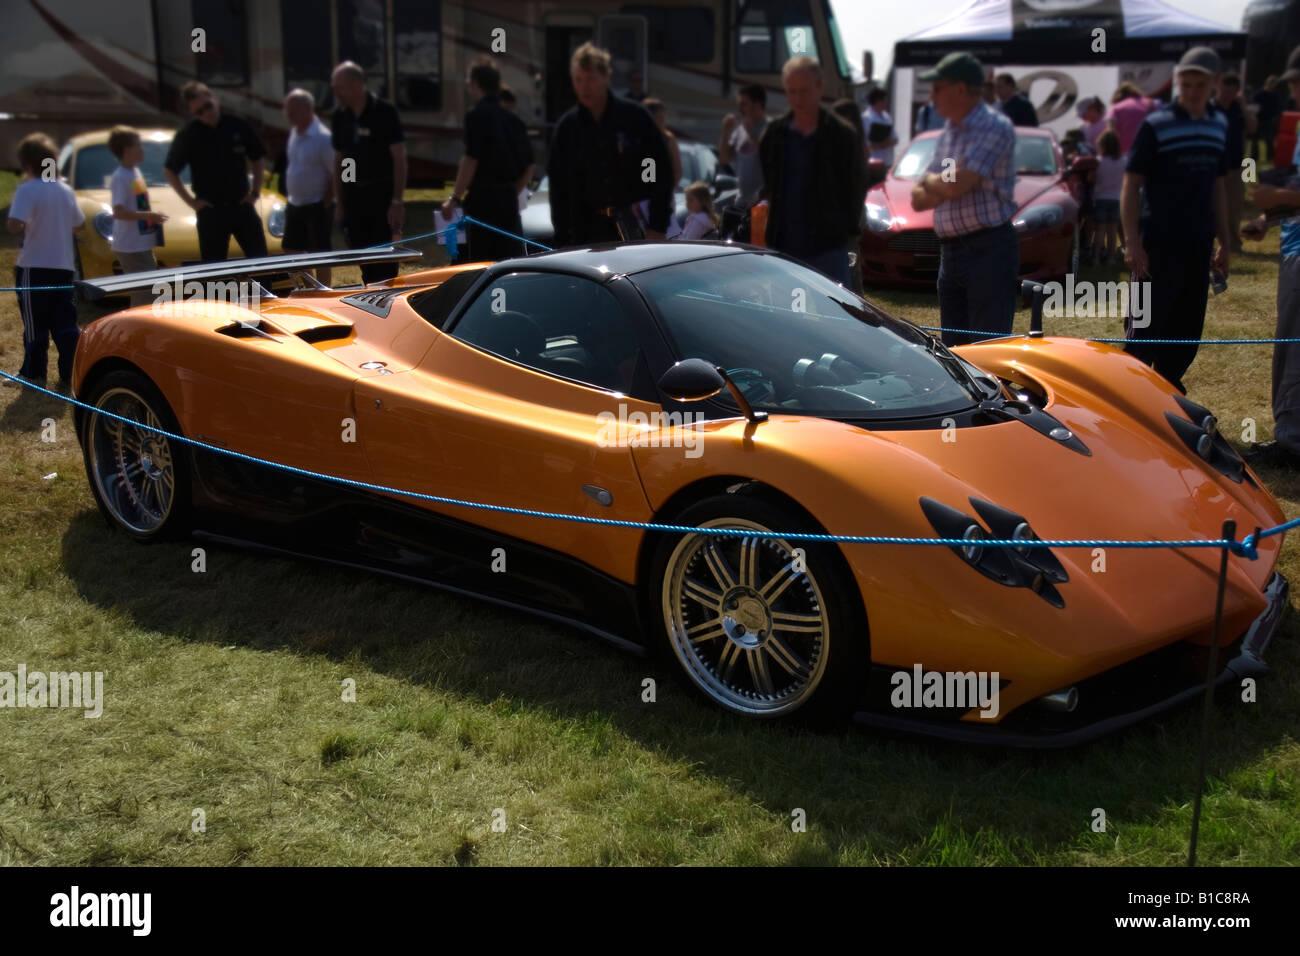 An interested crowd gather around an orange Pagani Zonda F Roadster